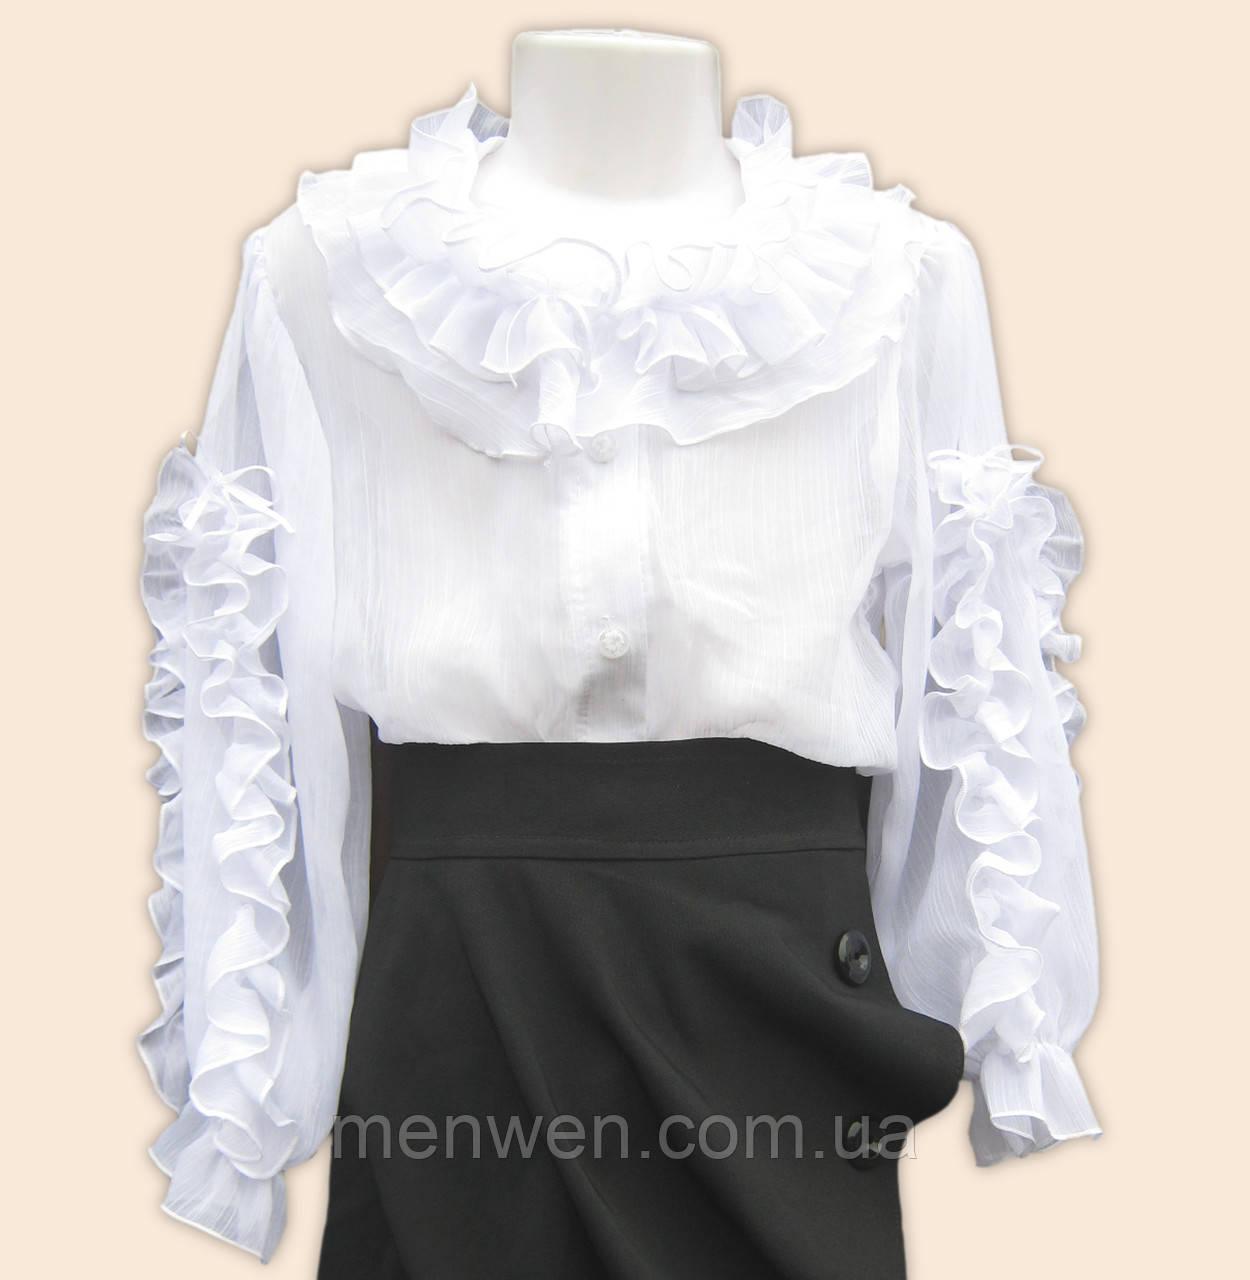 a4e147b5820 Школьная блузка для девочки  продажа